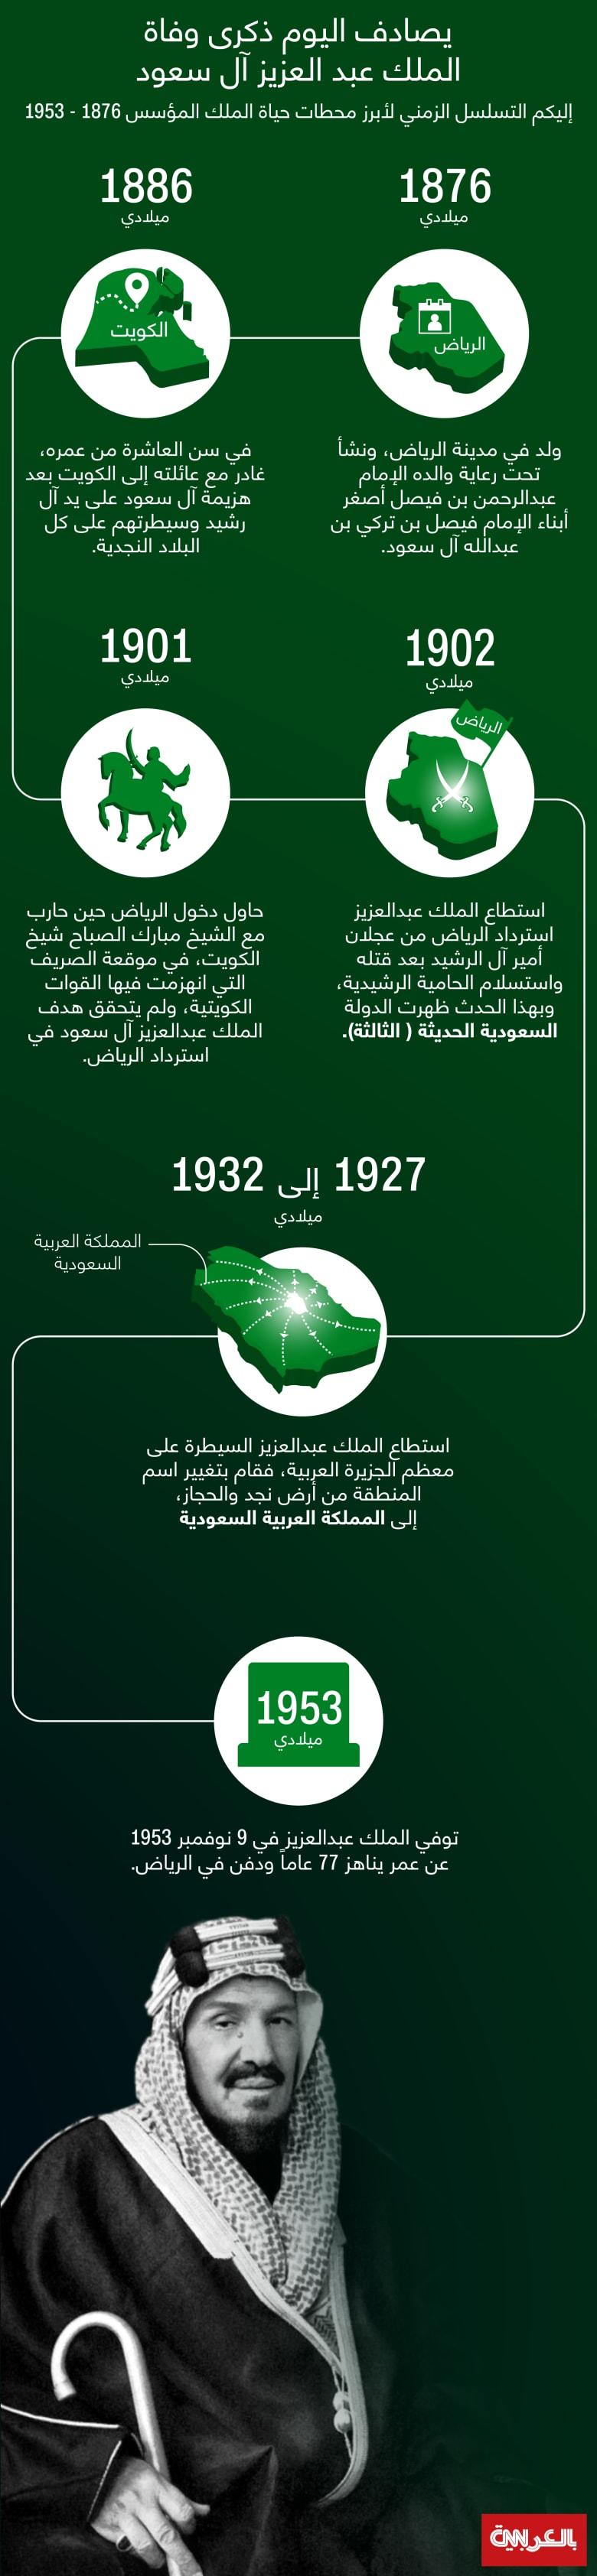 King-AbdulAziz-timeline